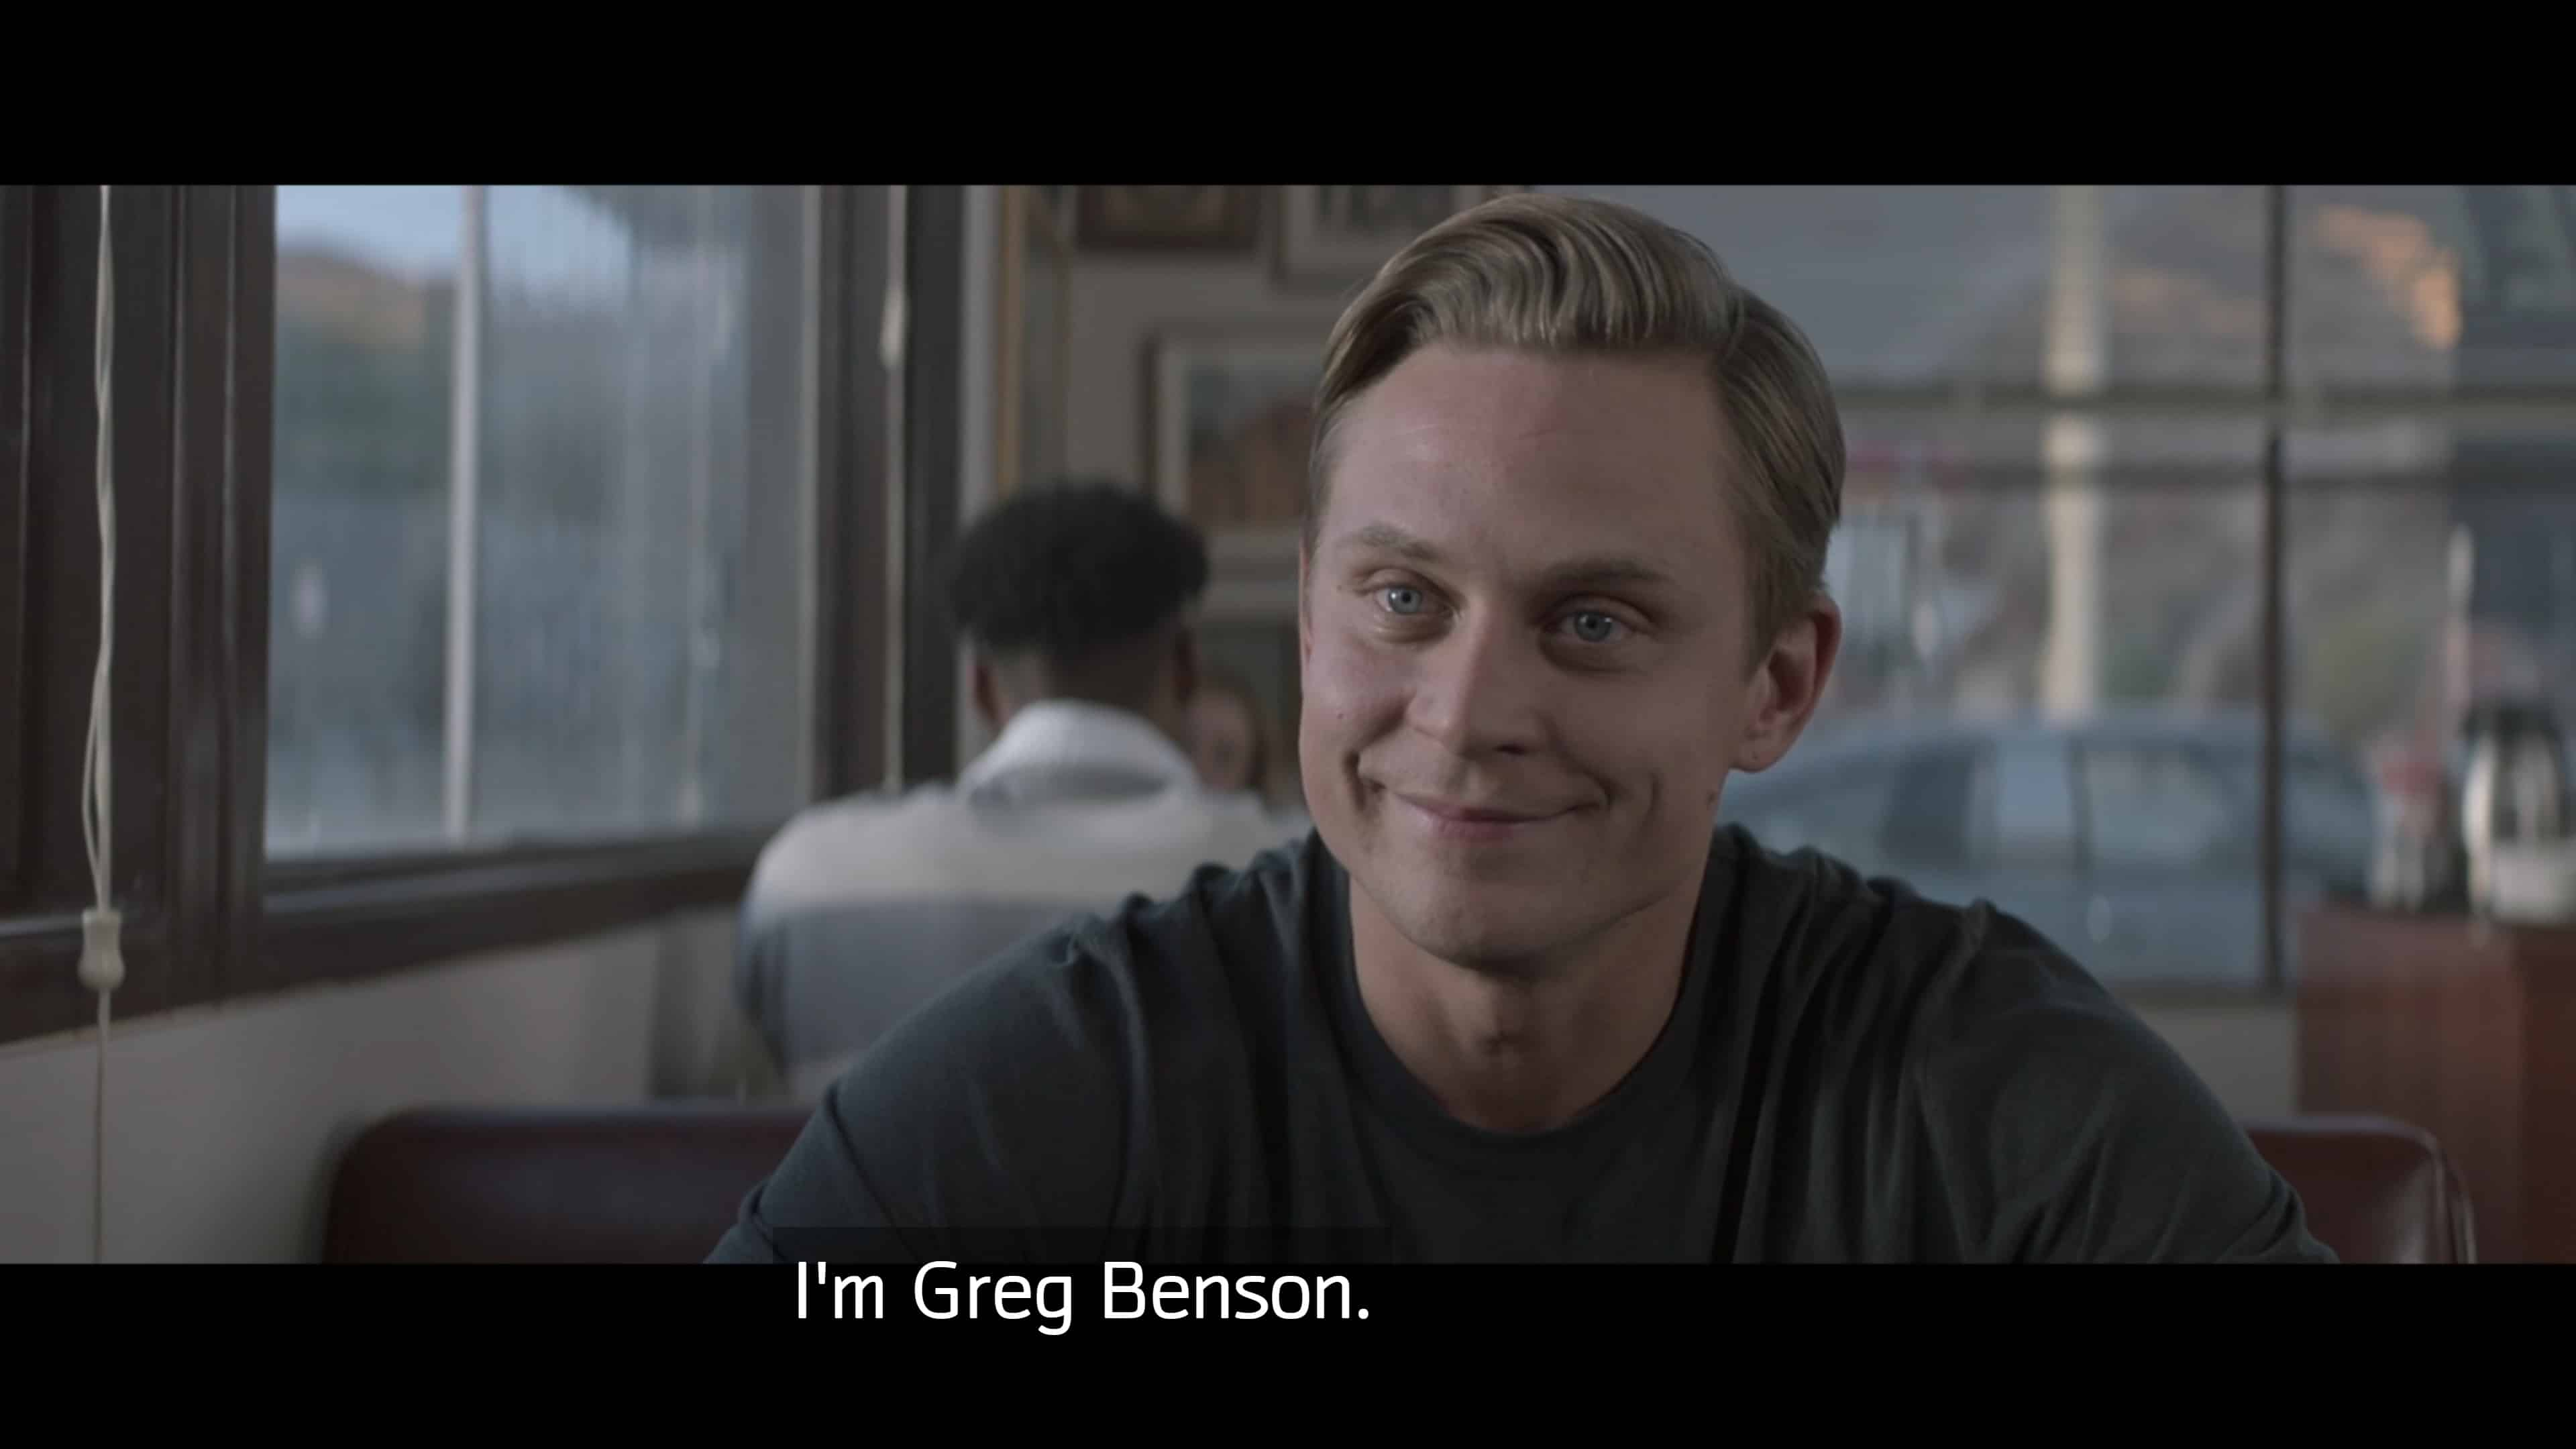 Byron revealing his real name is Greg Benson